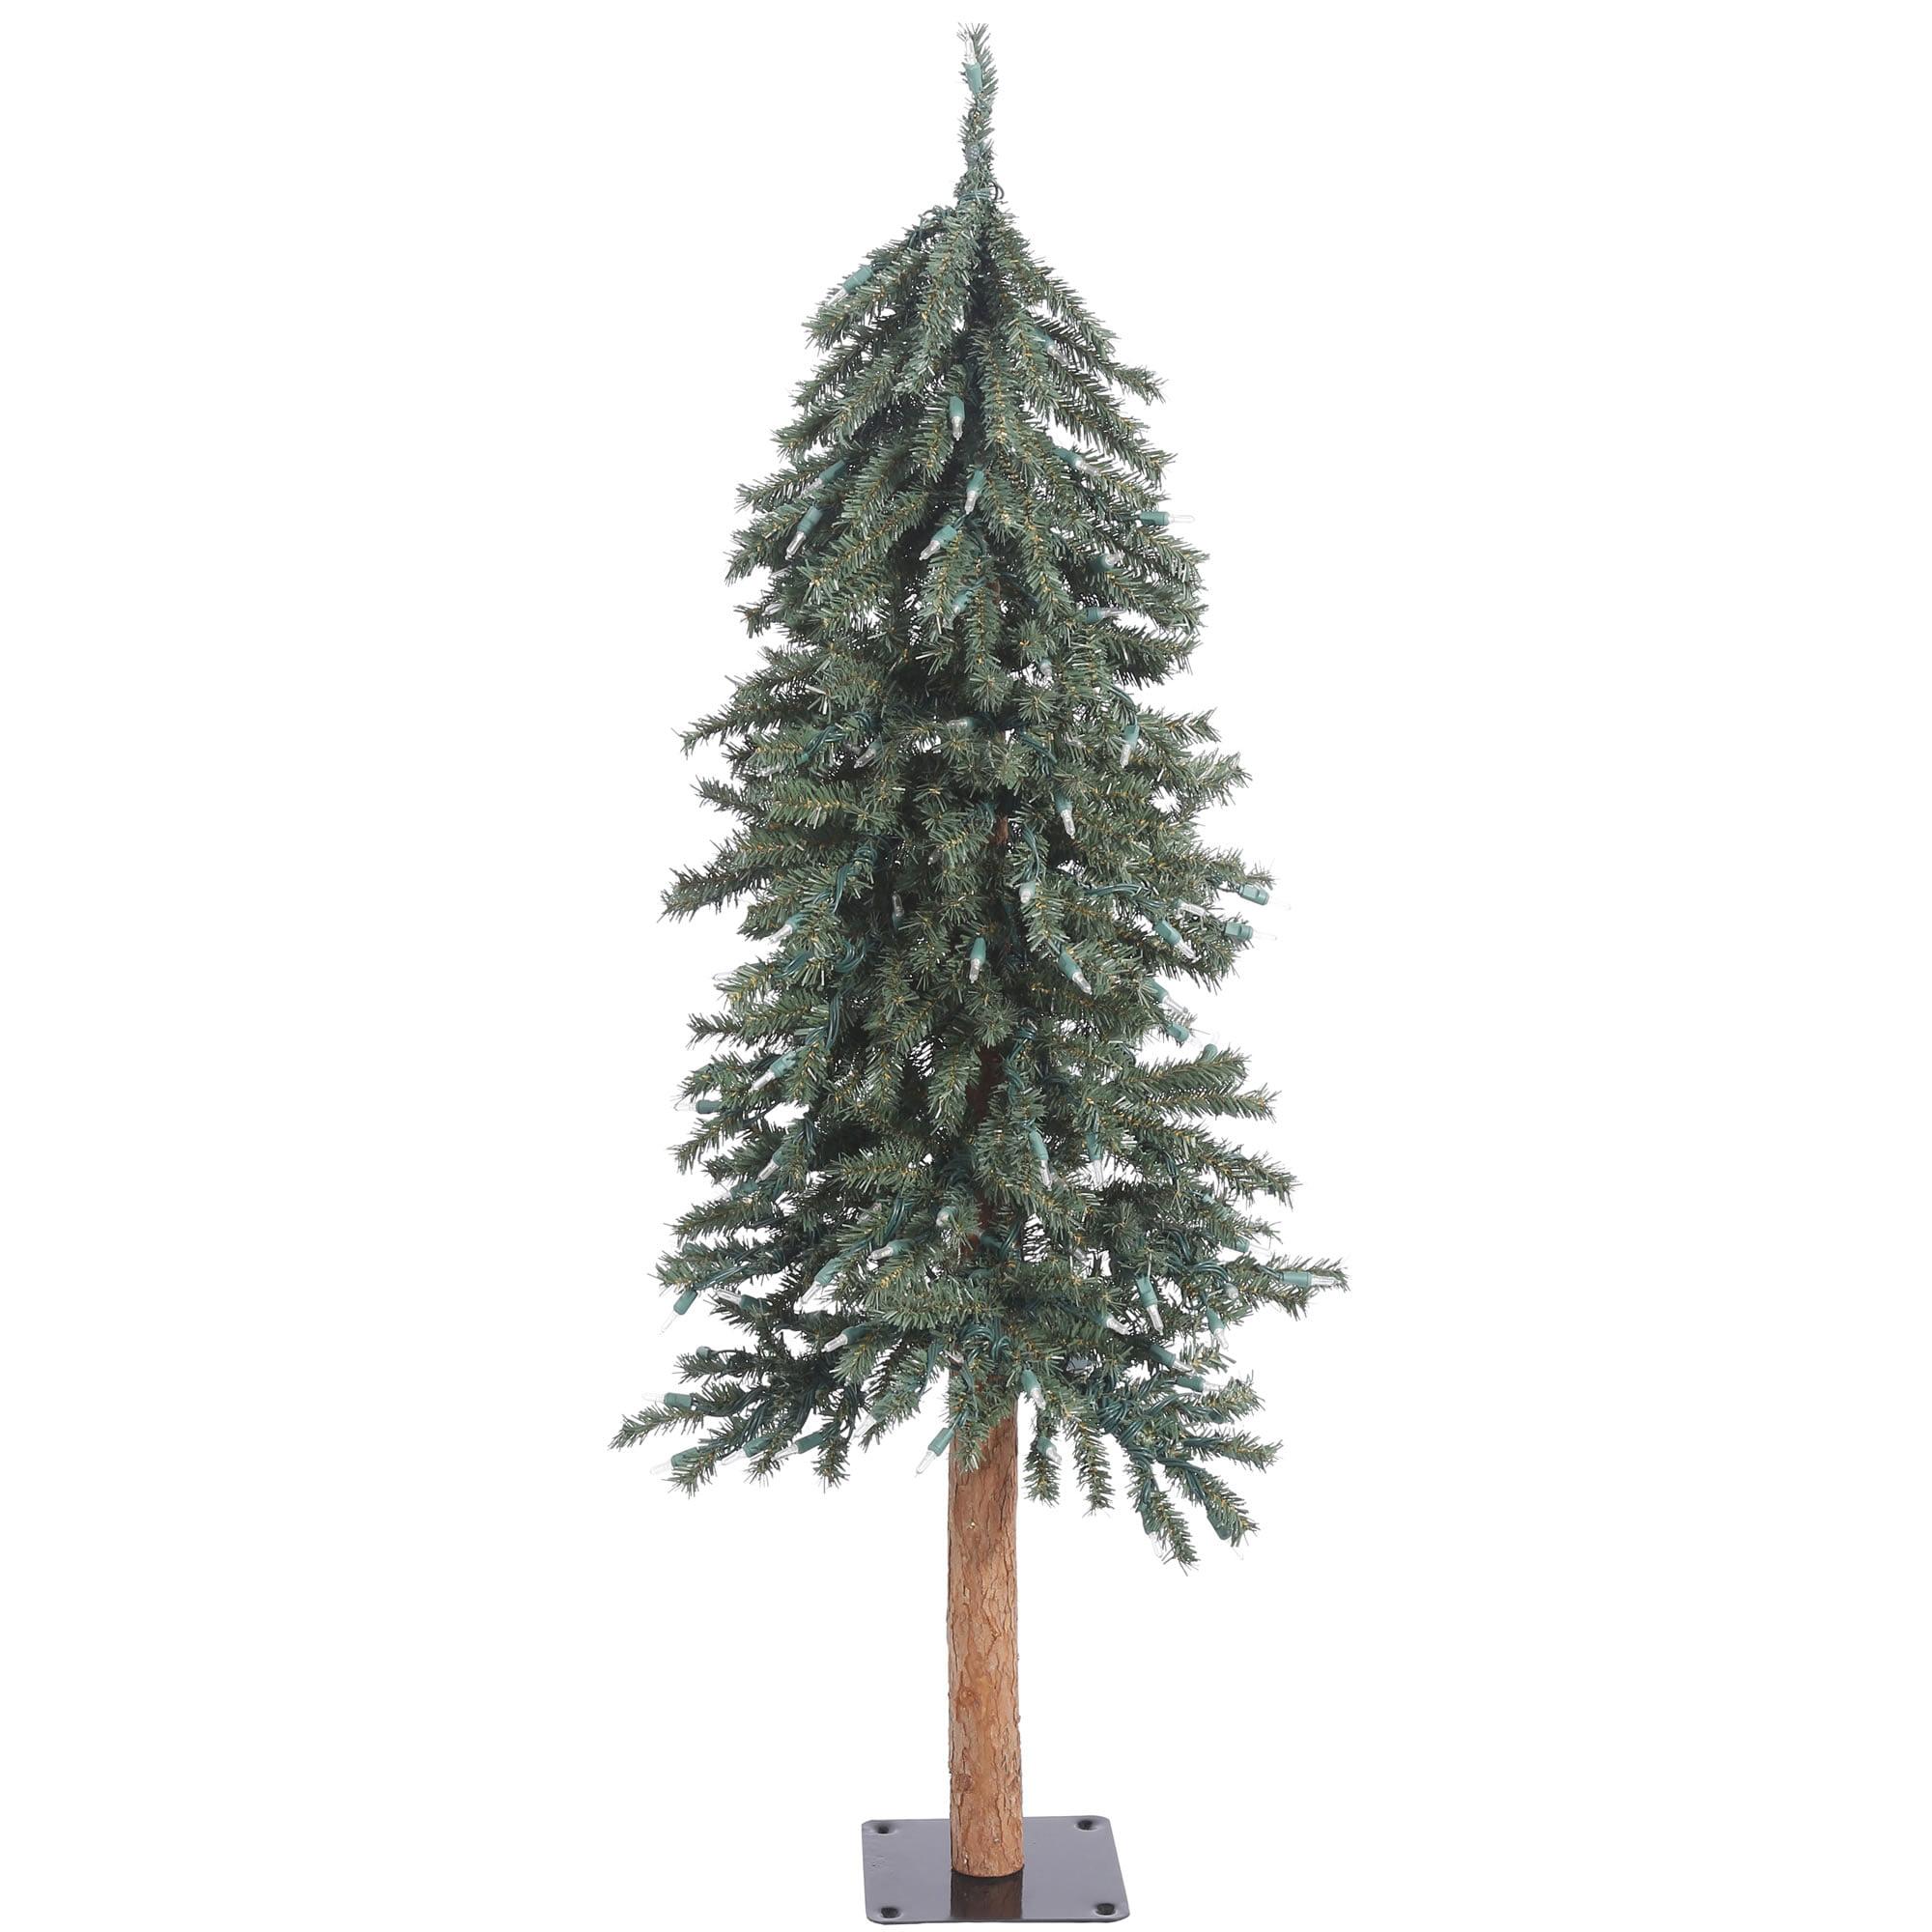 Vickerman Artificial Christmas Tree 2', 3', 4' Natural Bark Alpine Tree Set of 3